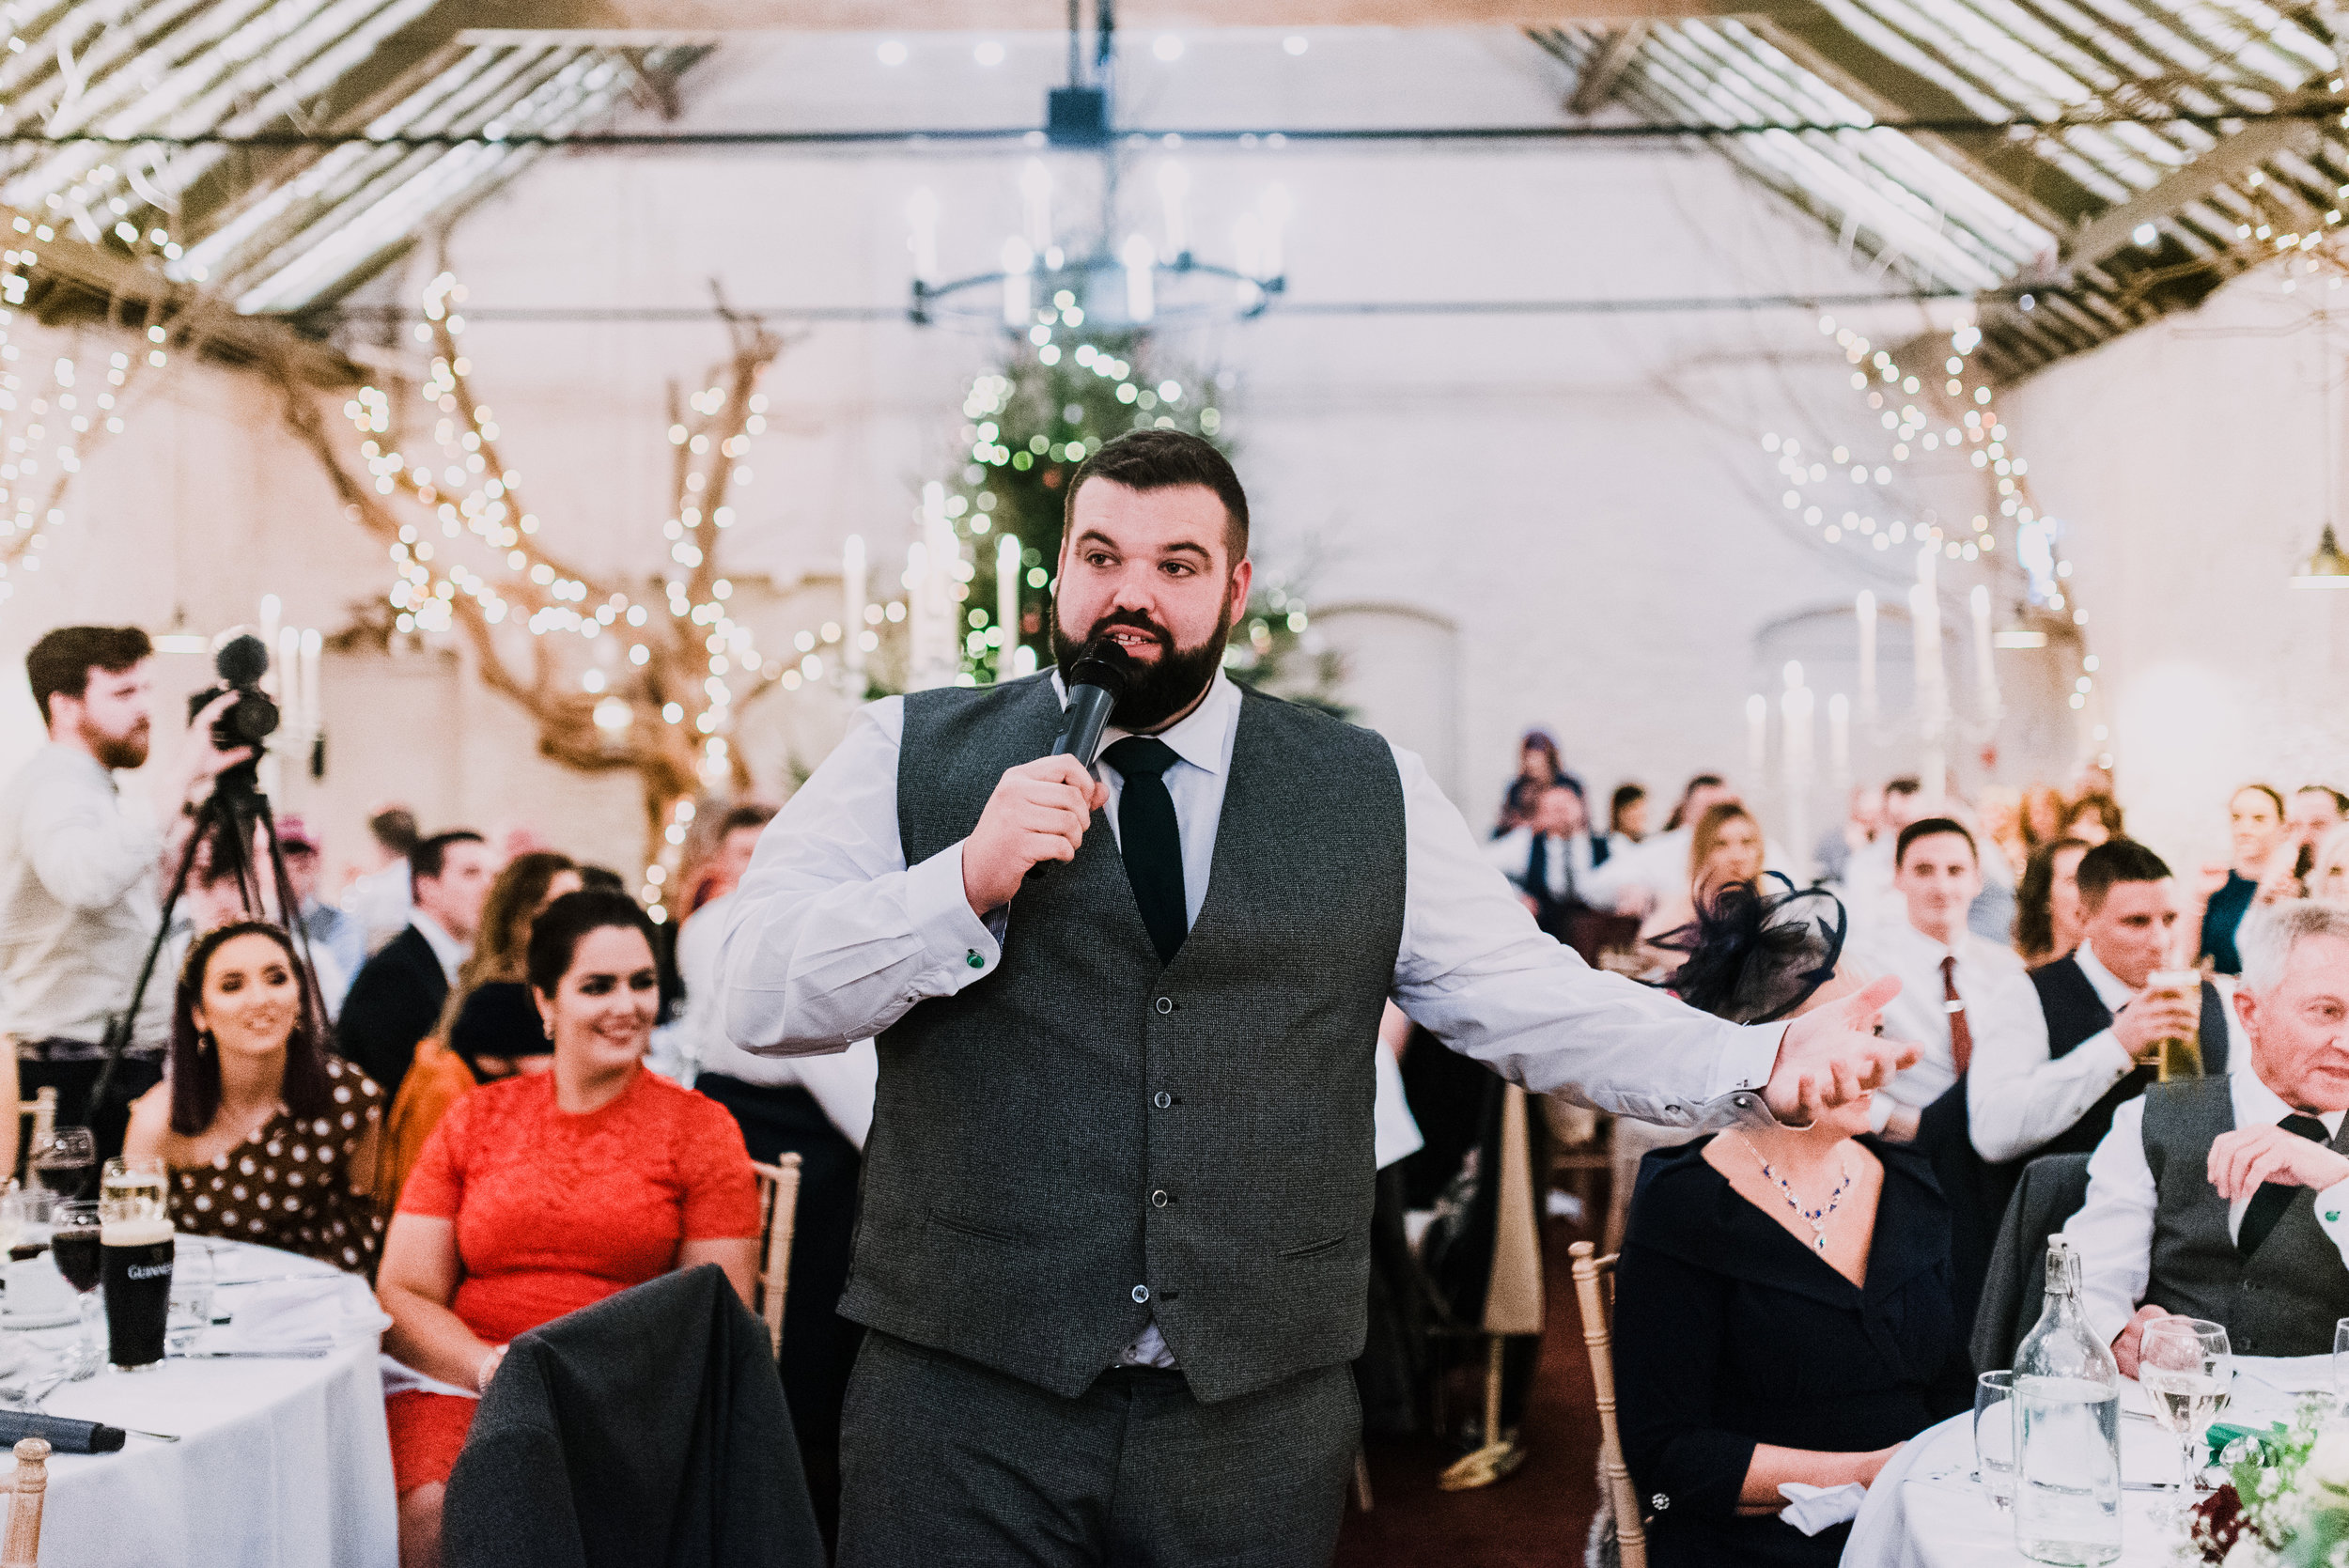 larchfield estate wedding, wedding venues northern ireland, barn wedding venues northern ireland, wedding photos larchfield estate, shane todd wedding, larchfield wedding decor ideas (14).jpg